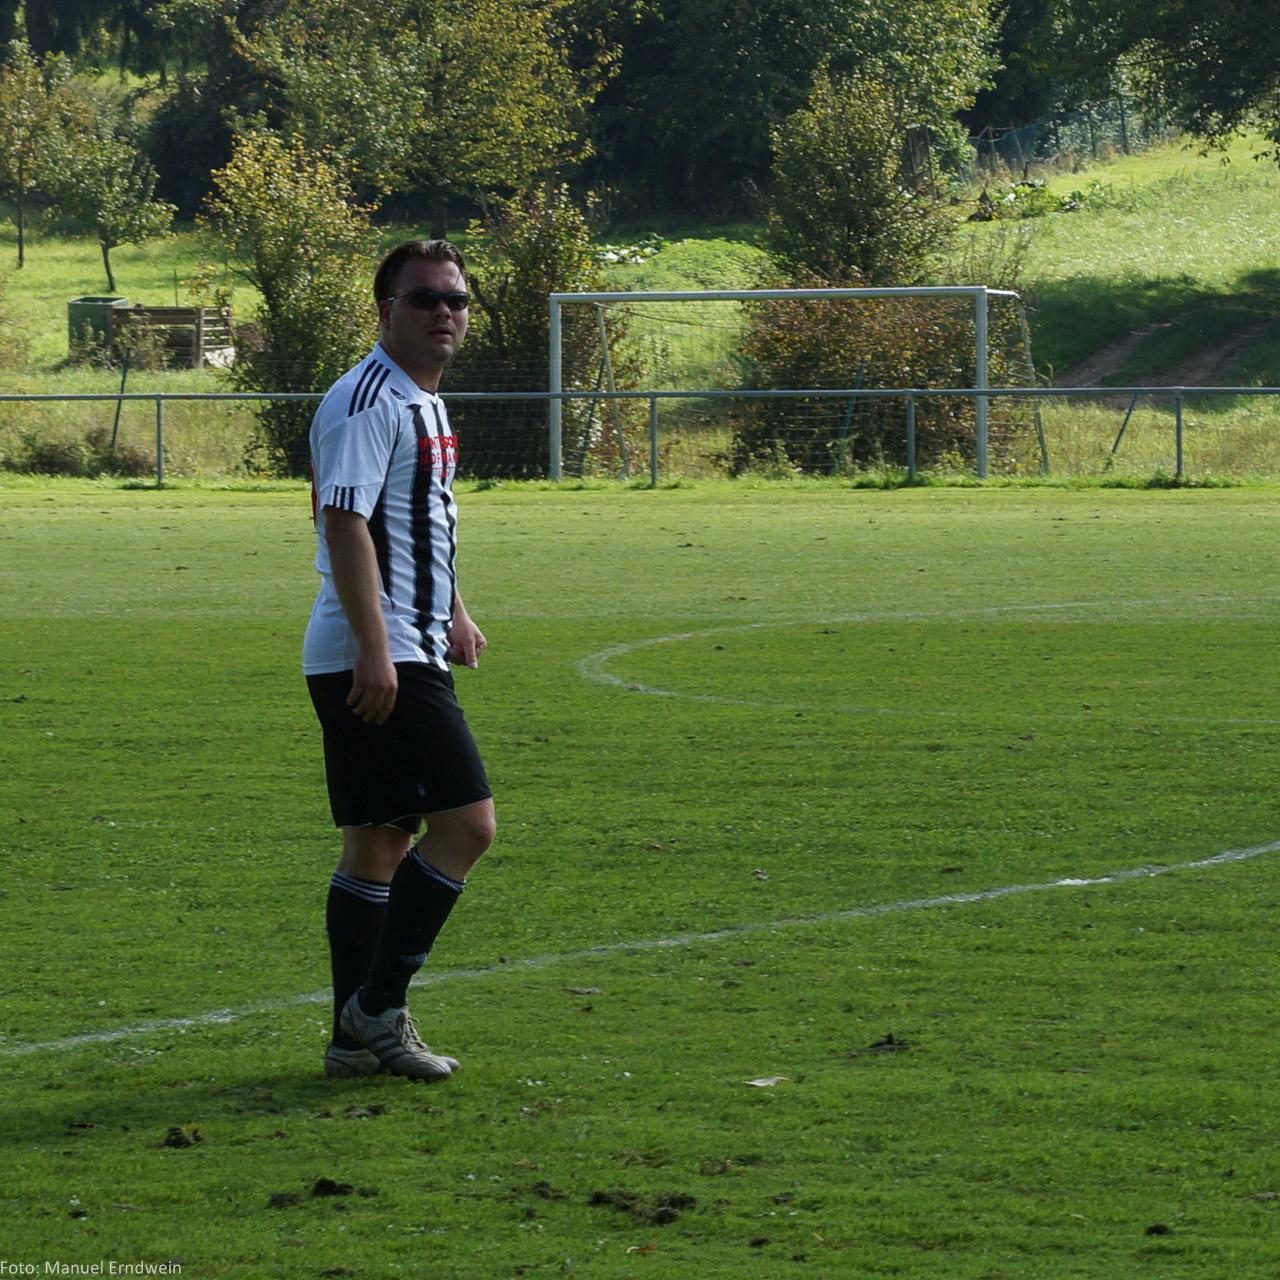 (c) Sportfoto EMANUEL - 20130922-1-0052